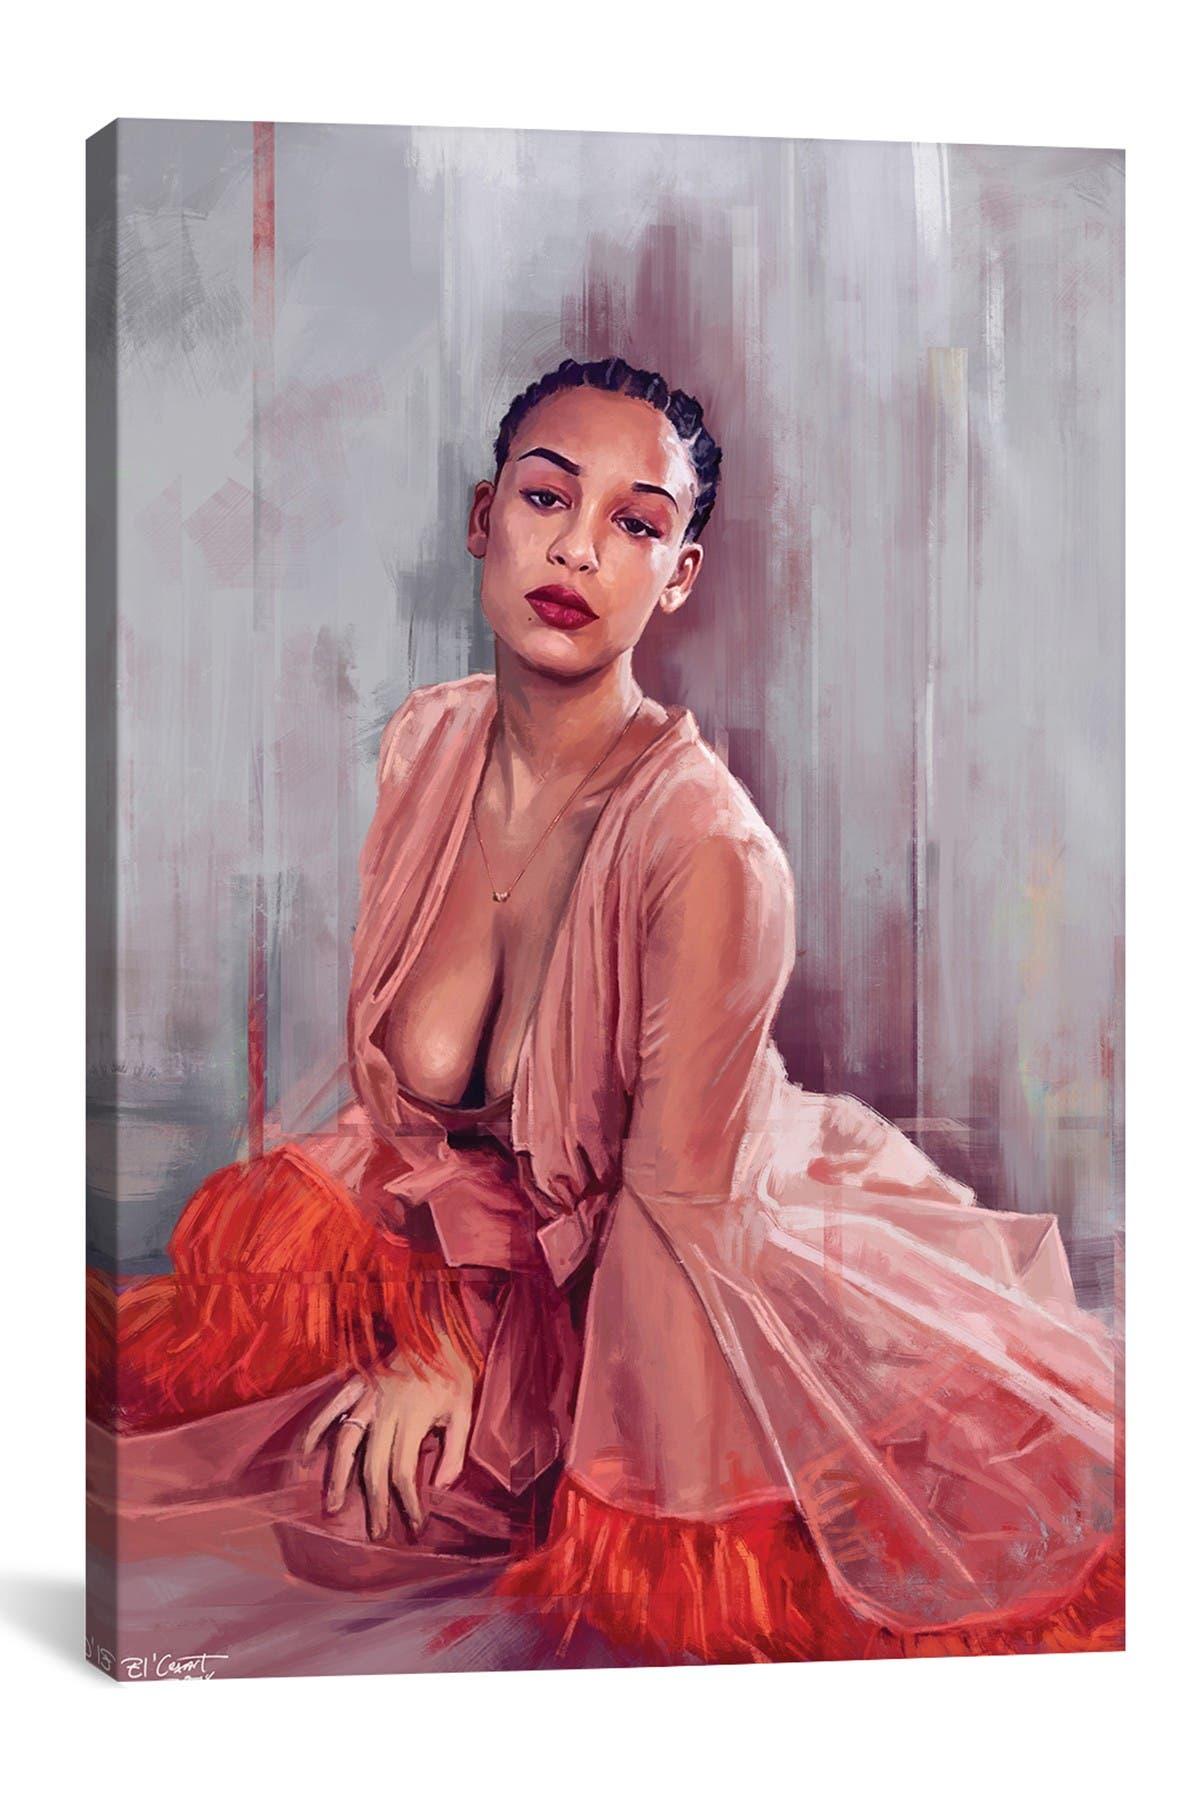 Image of iCanvas Jorja Smith by El'Cesart